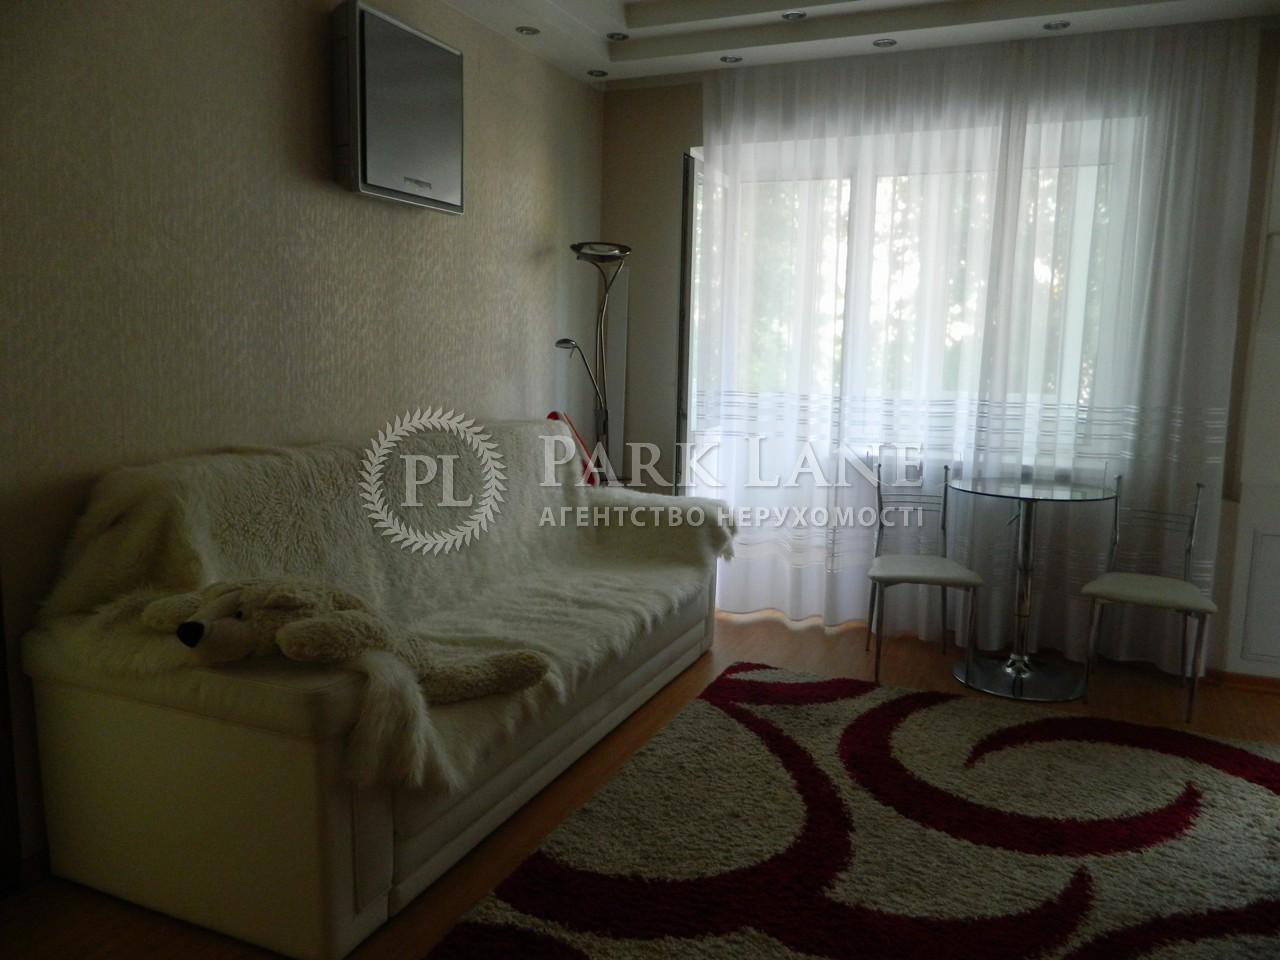 Квартира ул. Цитадельная, 9, Киев, L-24492 - Фото 3